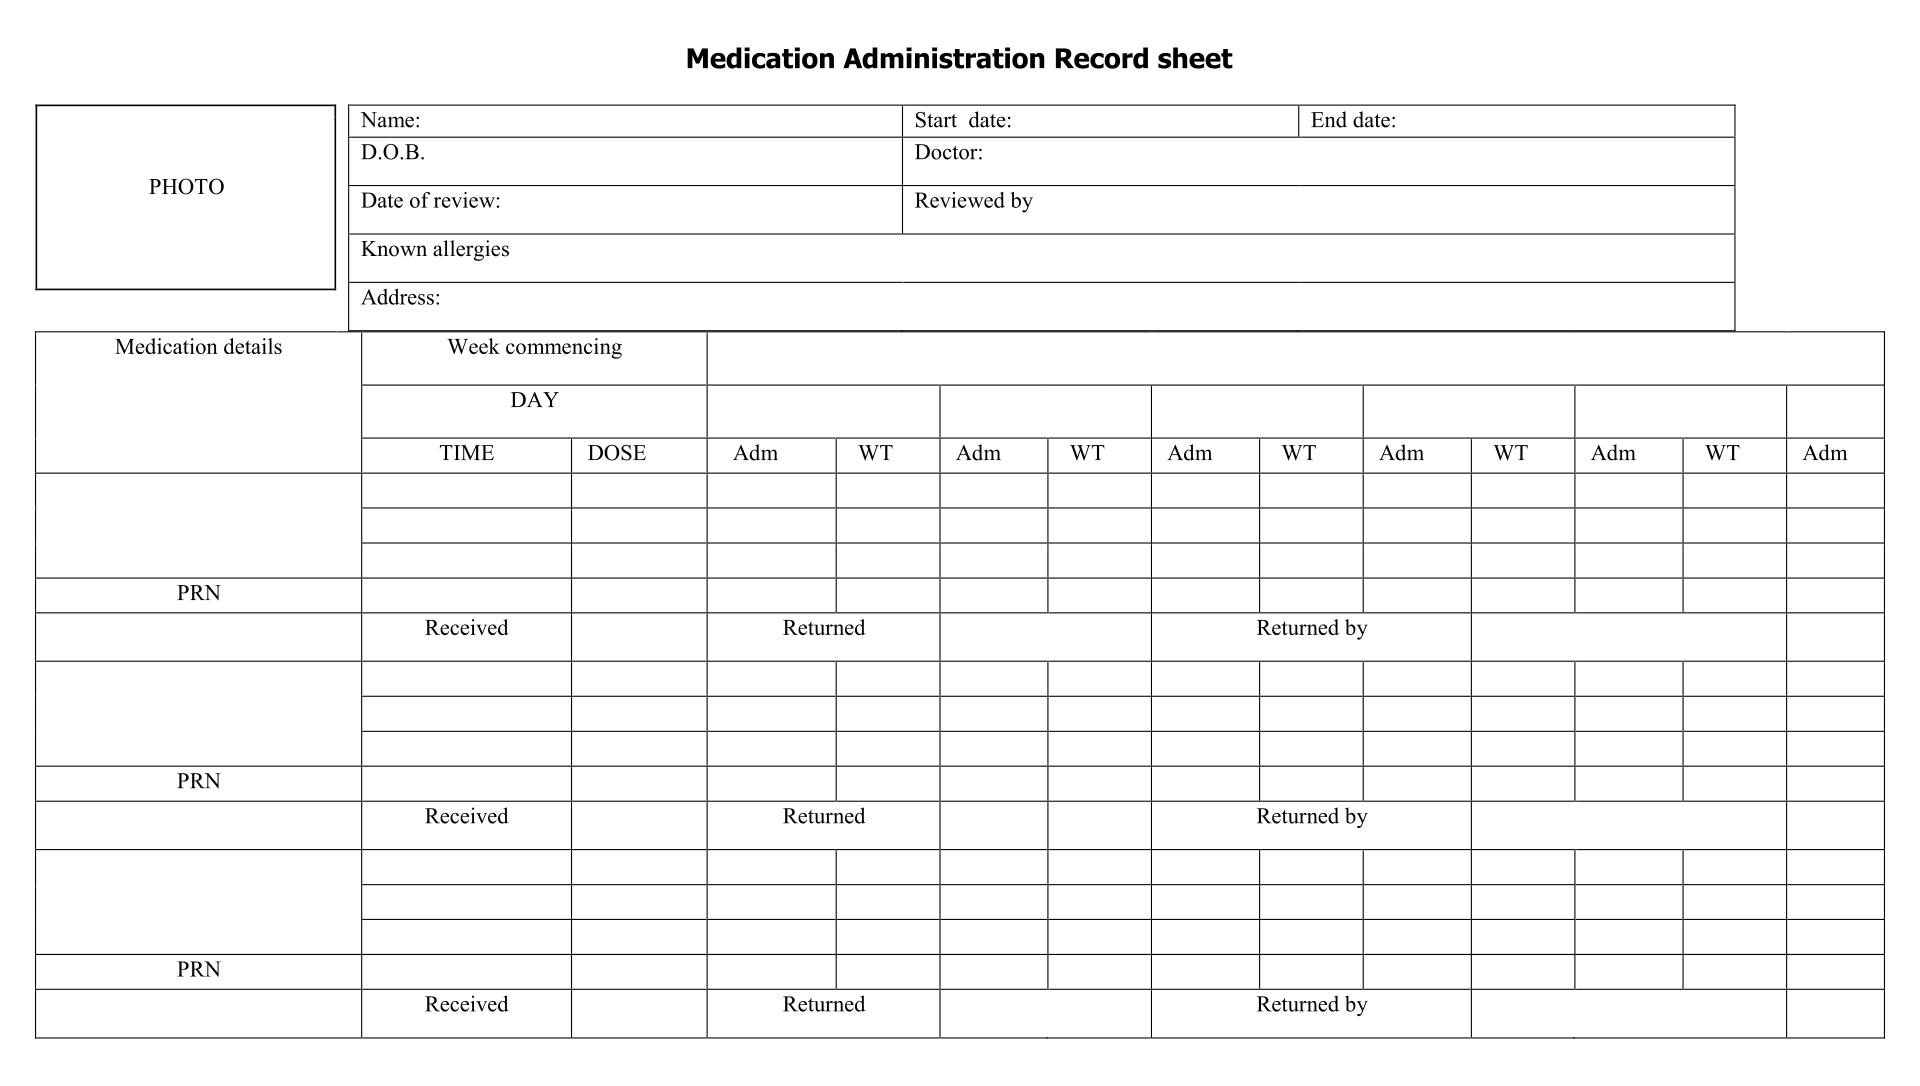 Medication Administration Record Sheet Blank